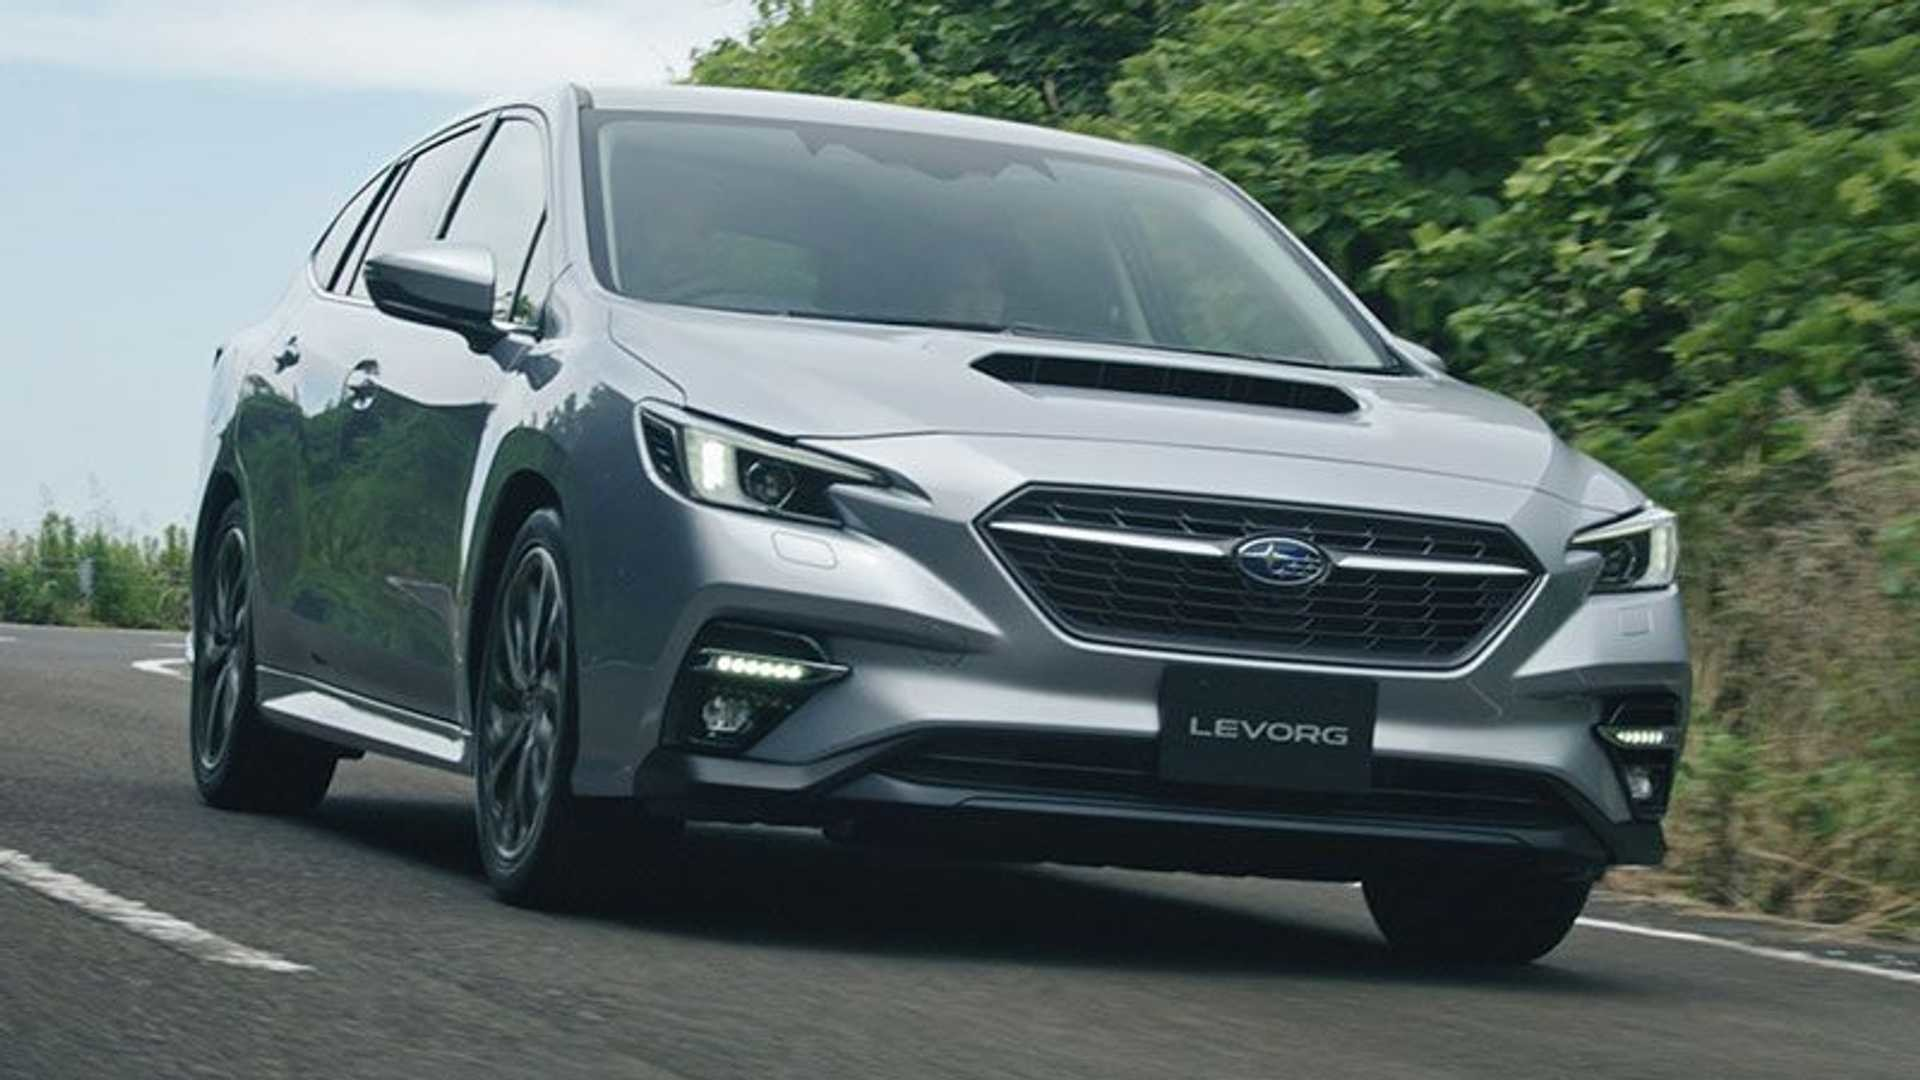 Foto de Subaru Levorg 2021 (16/17)